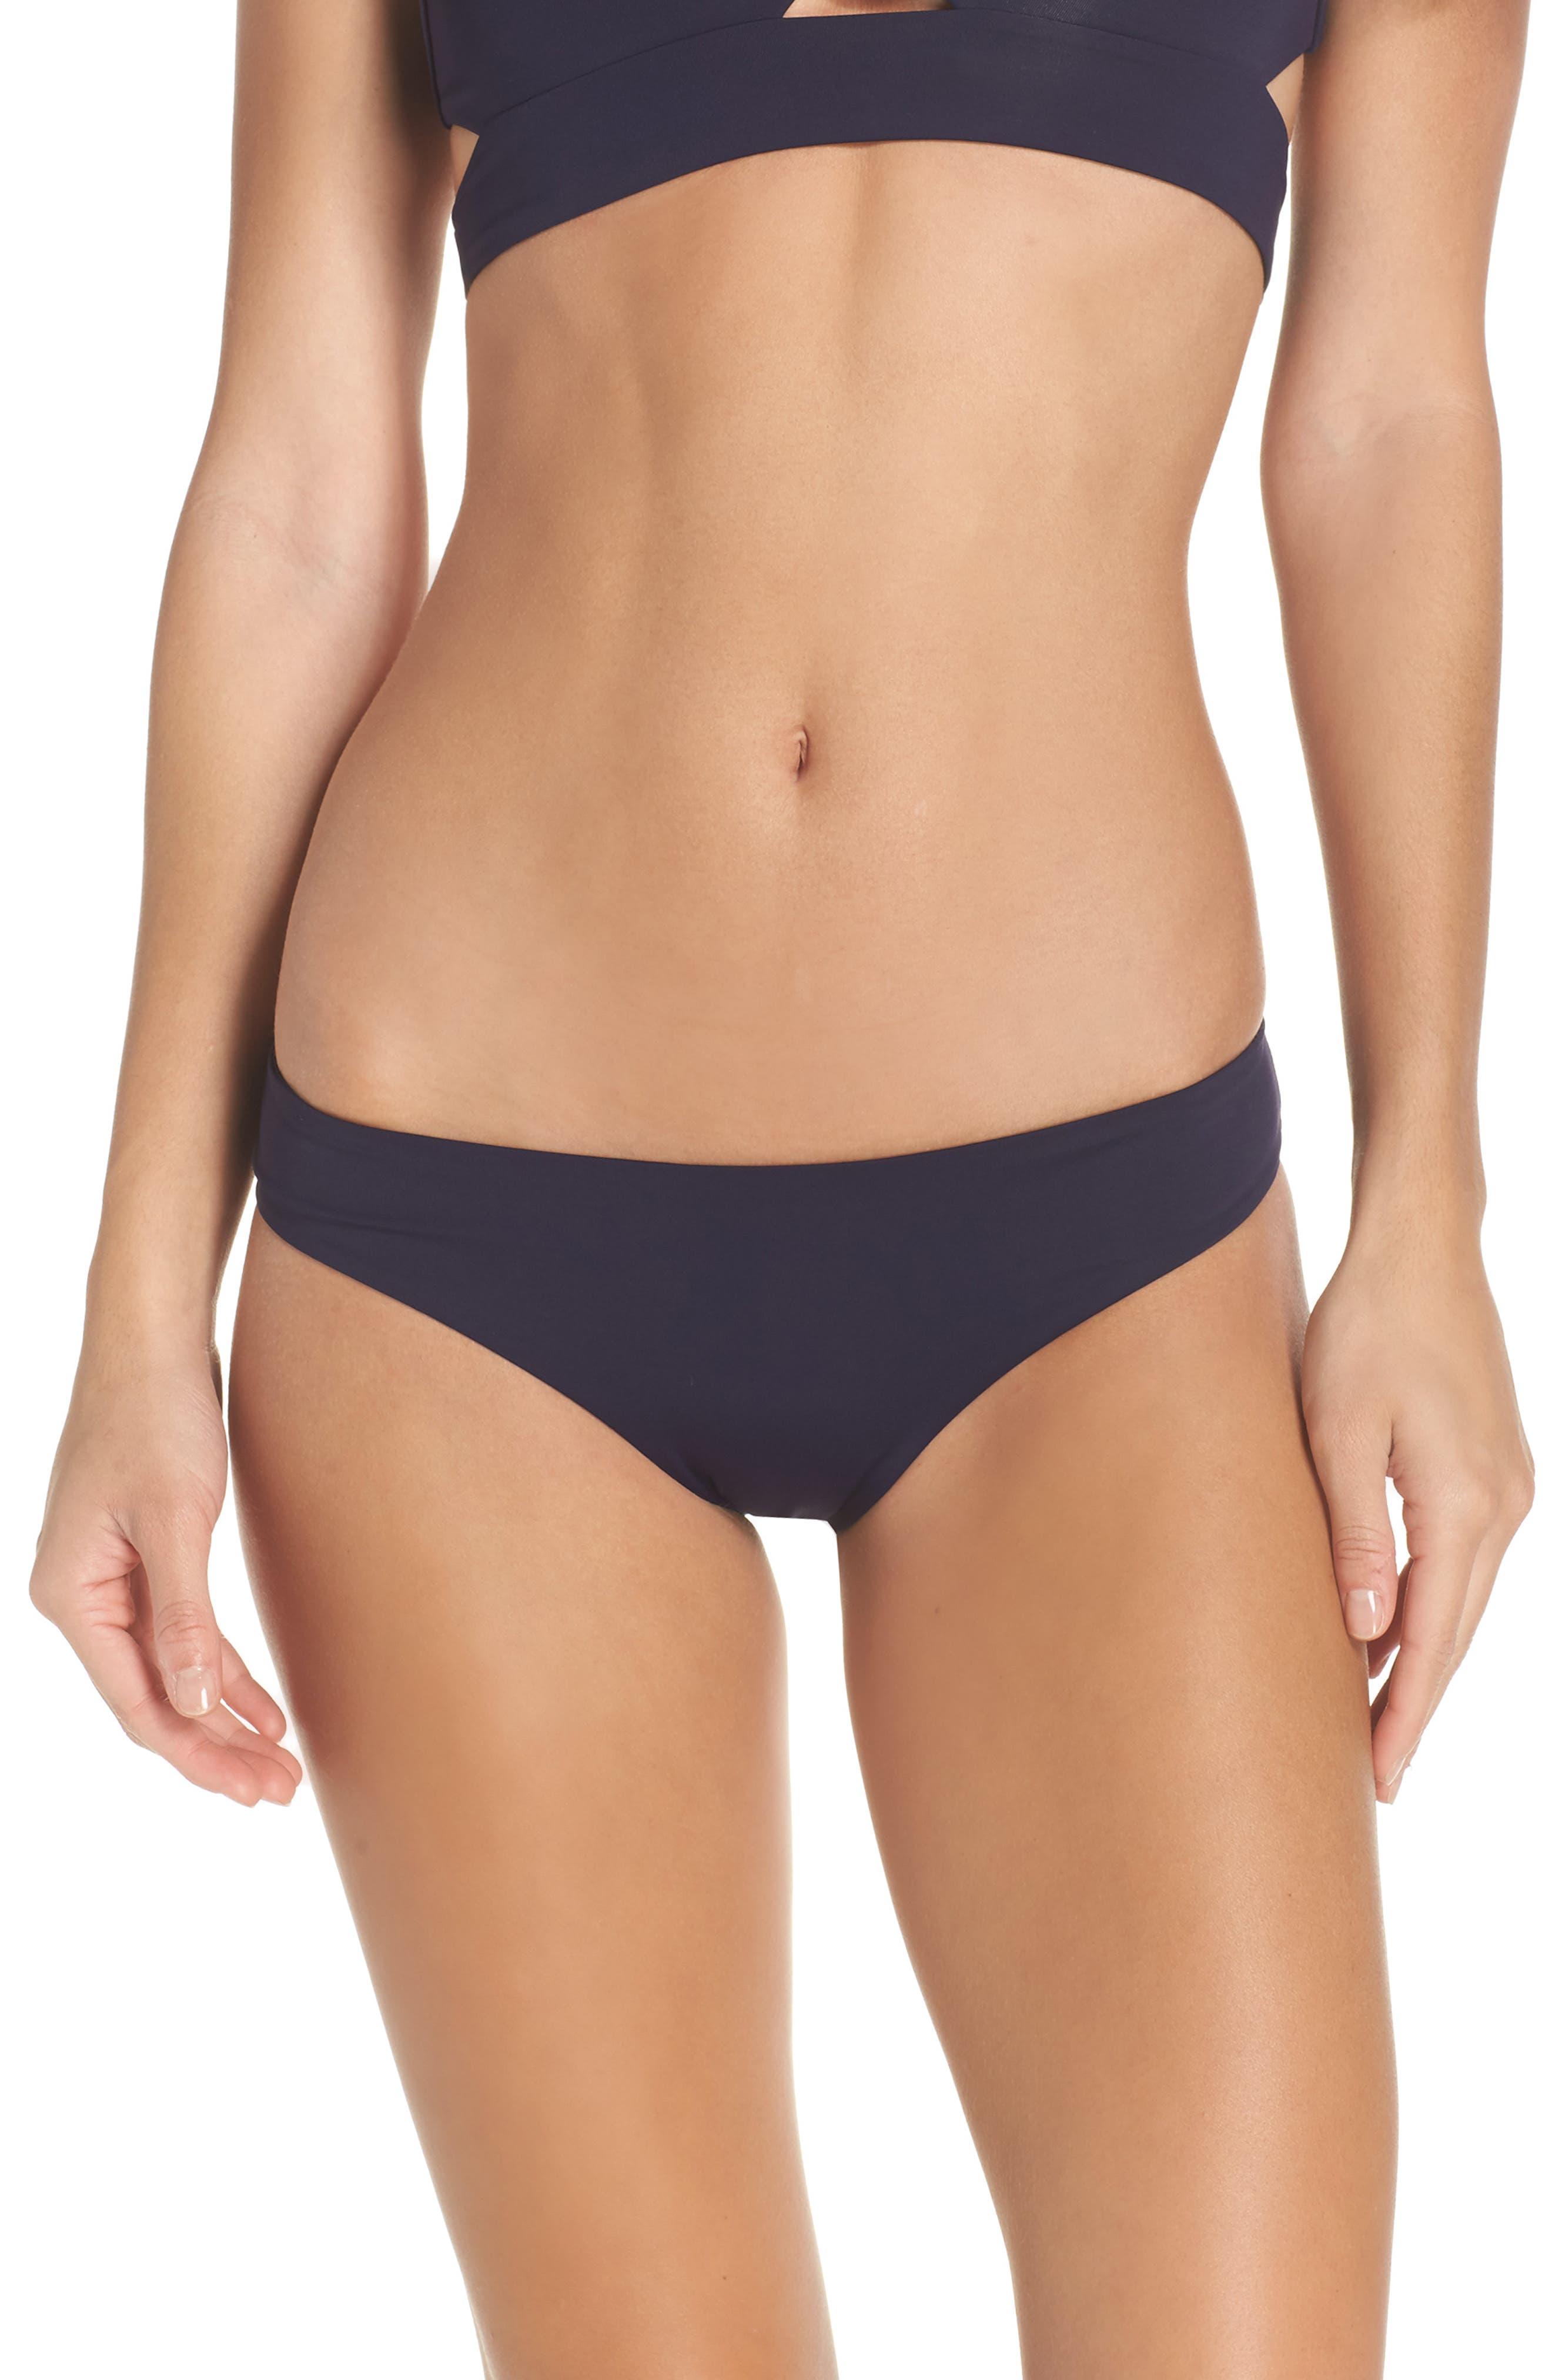 Alternate Image 1 Selected - TAVIK 'Ali' Moderate Coverage Bikini Bottoms